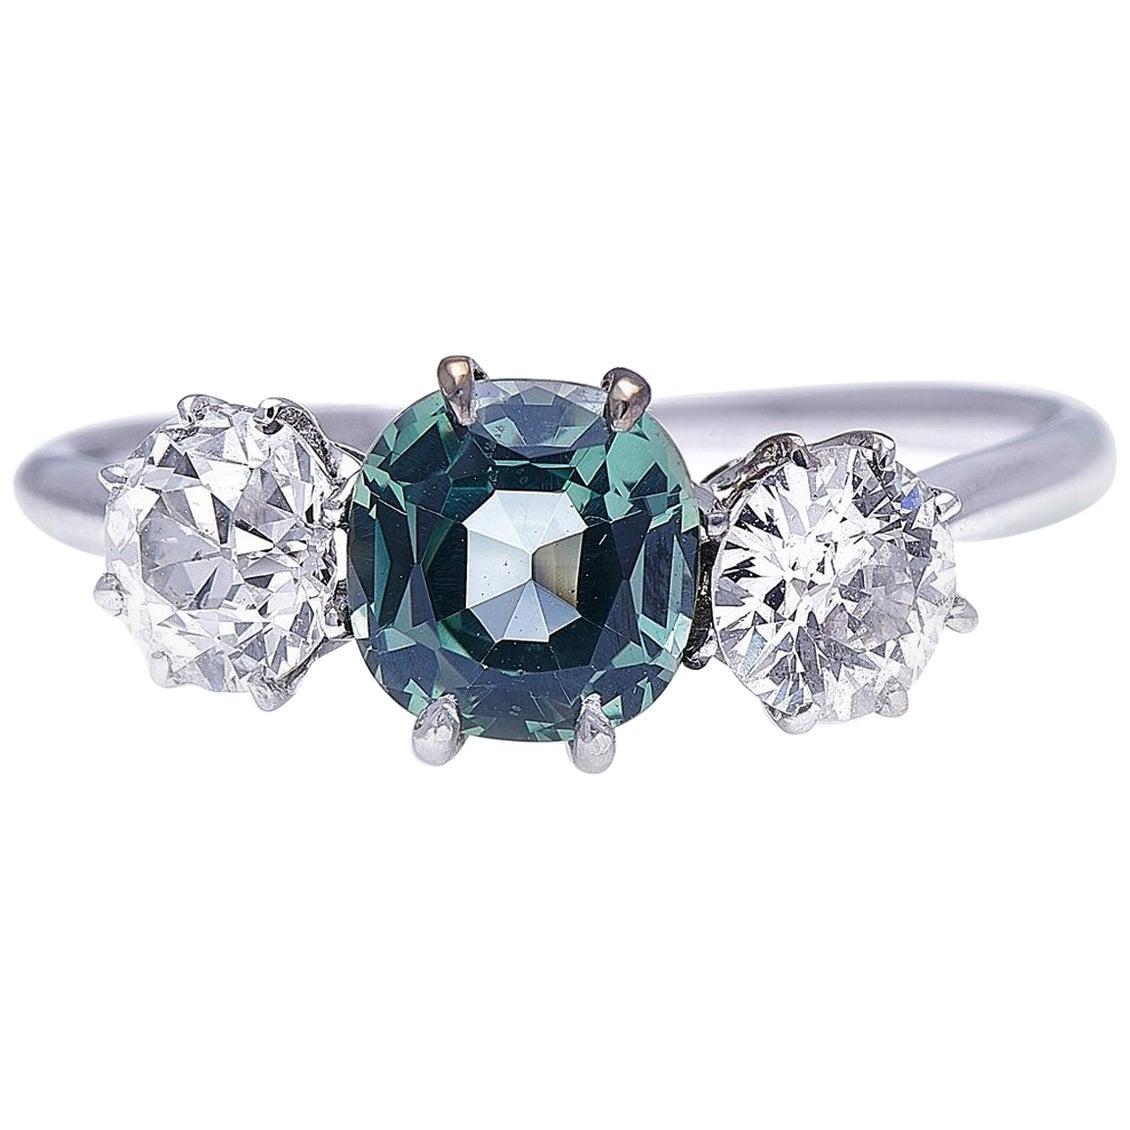 Antique, Art Deco, Platinum, Green Sapphire and Diamond Three-Stone Ring